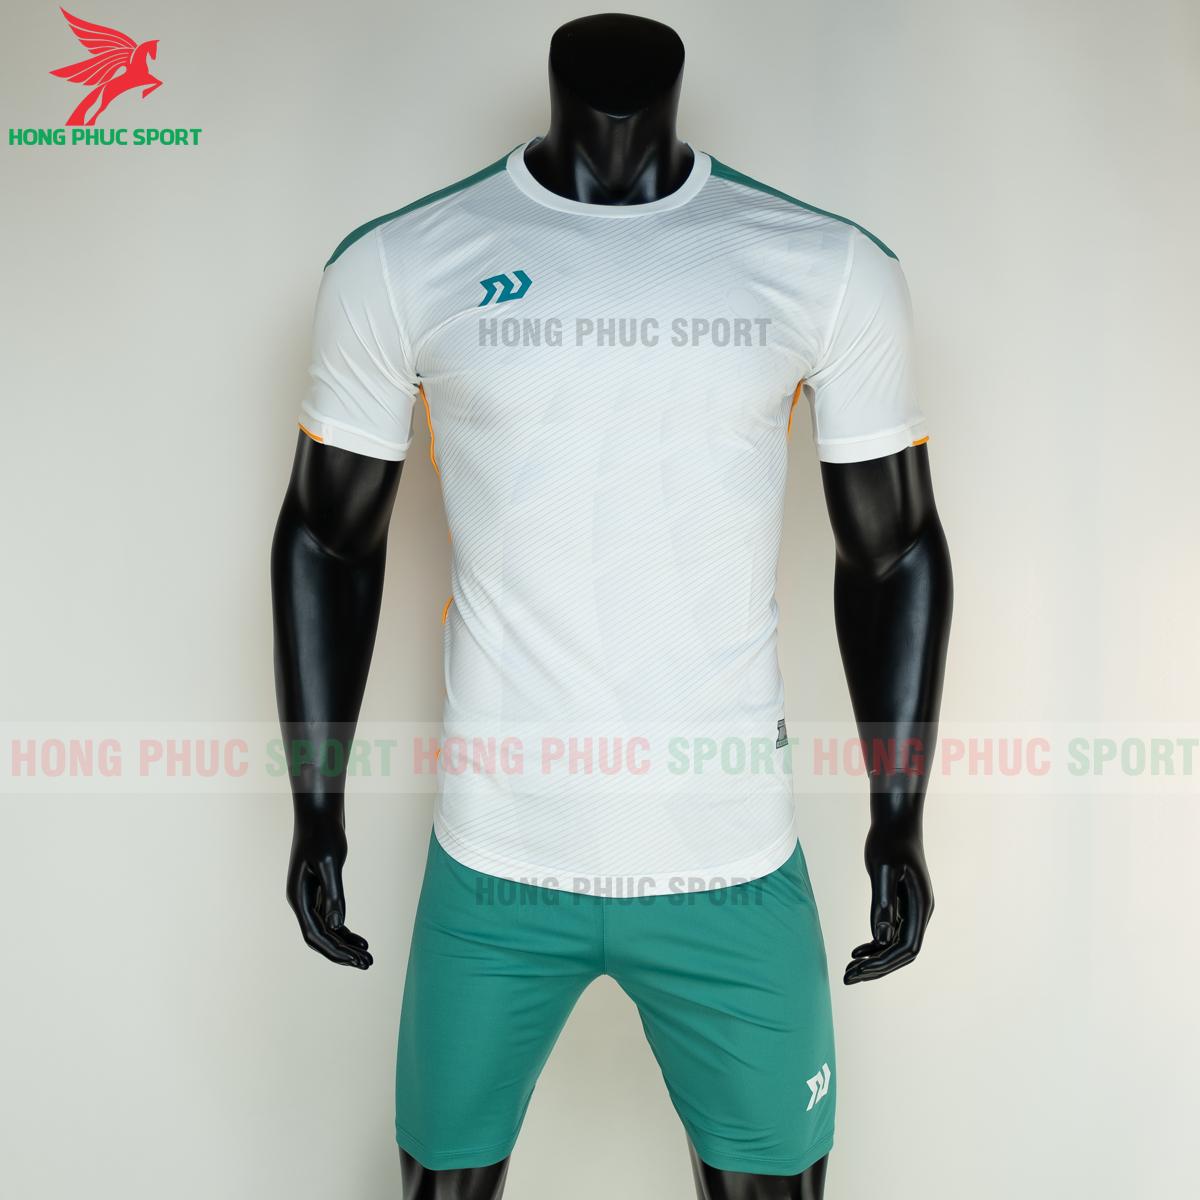 https://cdn.hongphucsport.com/unsafe/s4.shopbay.vn/files/285/ao-bong-da-khong-logo-bulbal-lotus-mau-trang-2-604f3ab60564e.png